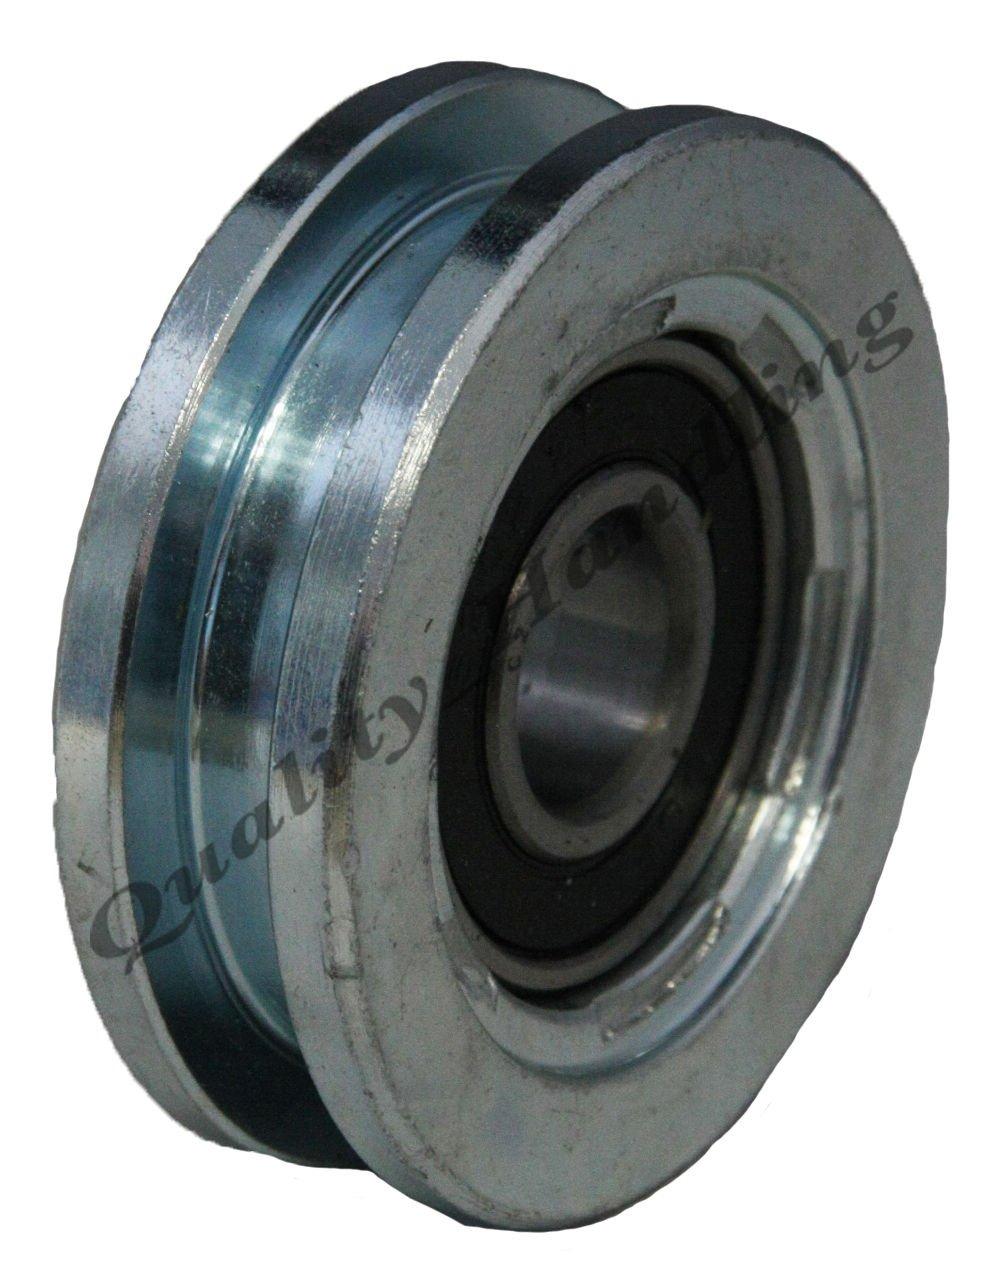 Parnells sliding gate wheel pulley wheel 60mm Square groove steel wheel U shape IBFM